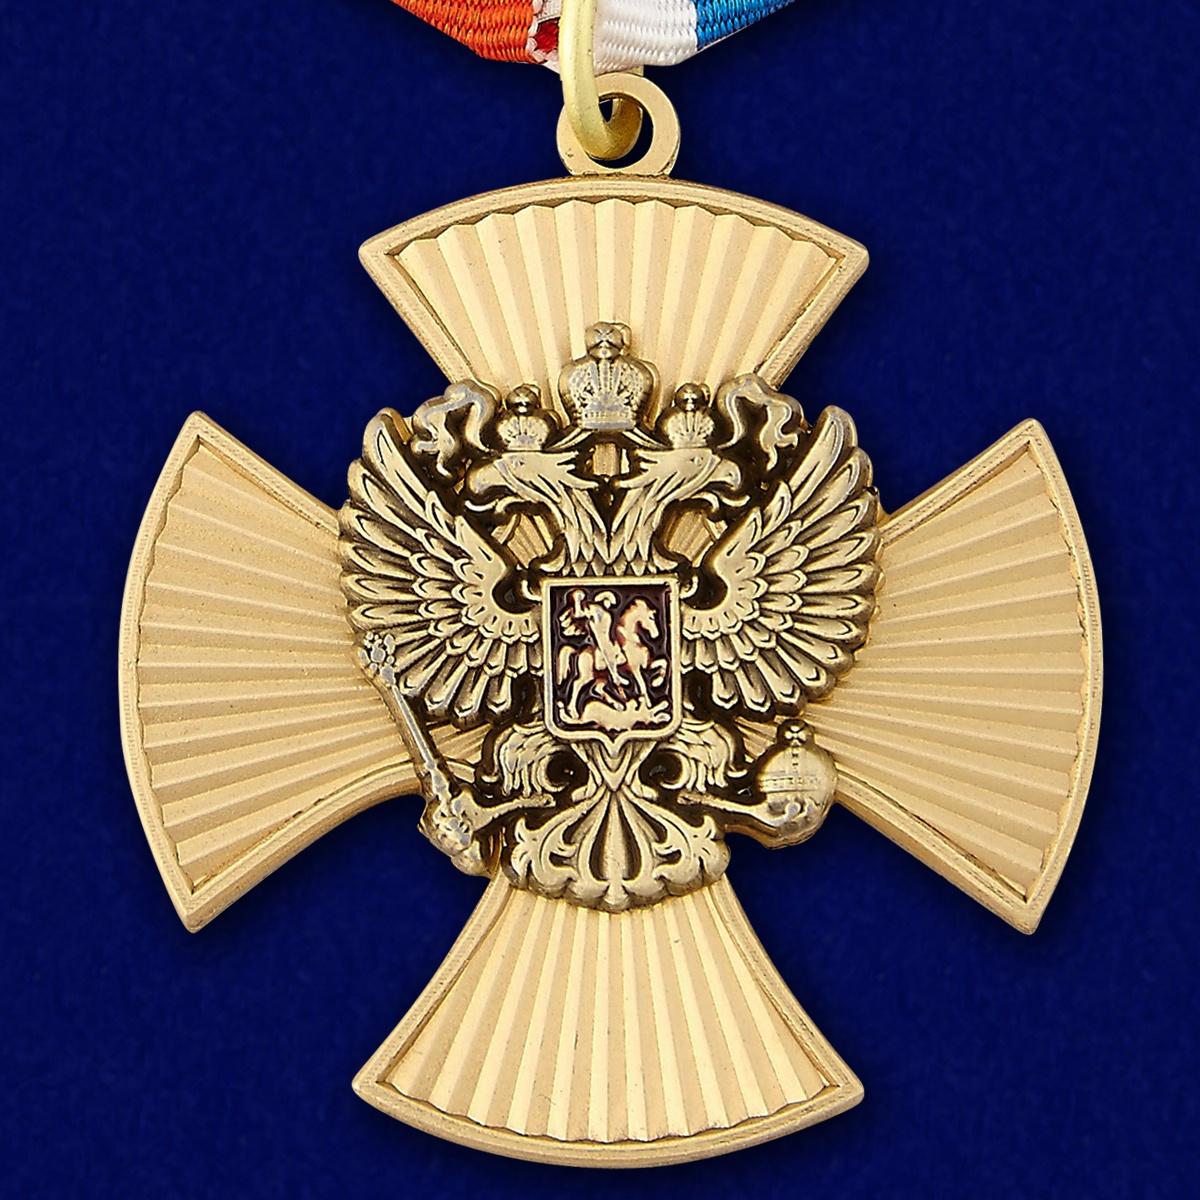 Наградной крест «За заслуги» - любое количество с доставкой по Москве и РФ